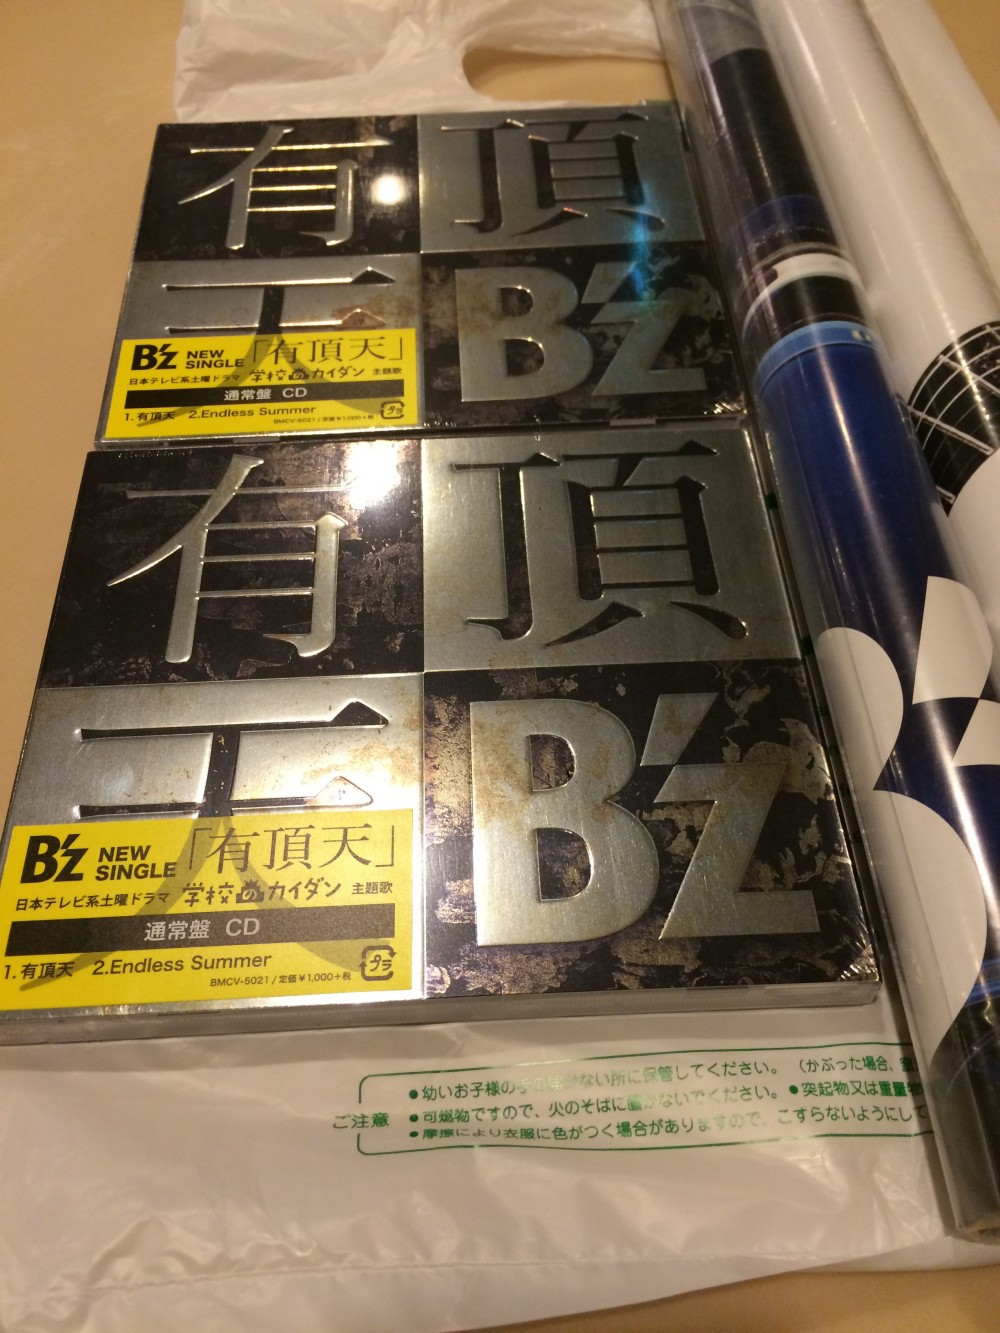 B'z「有頂天」が早くもオリコンにて売り上げ1位ですよ~